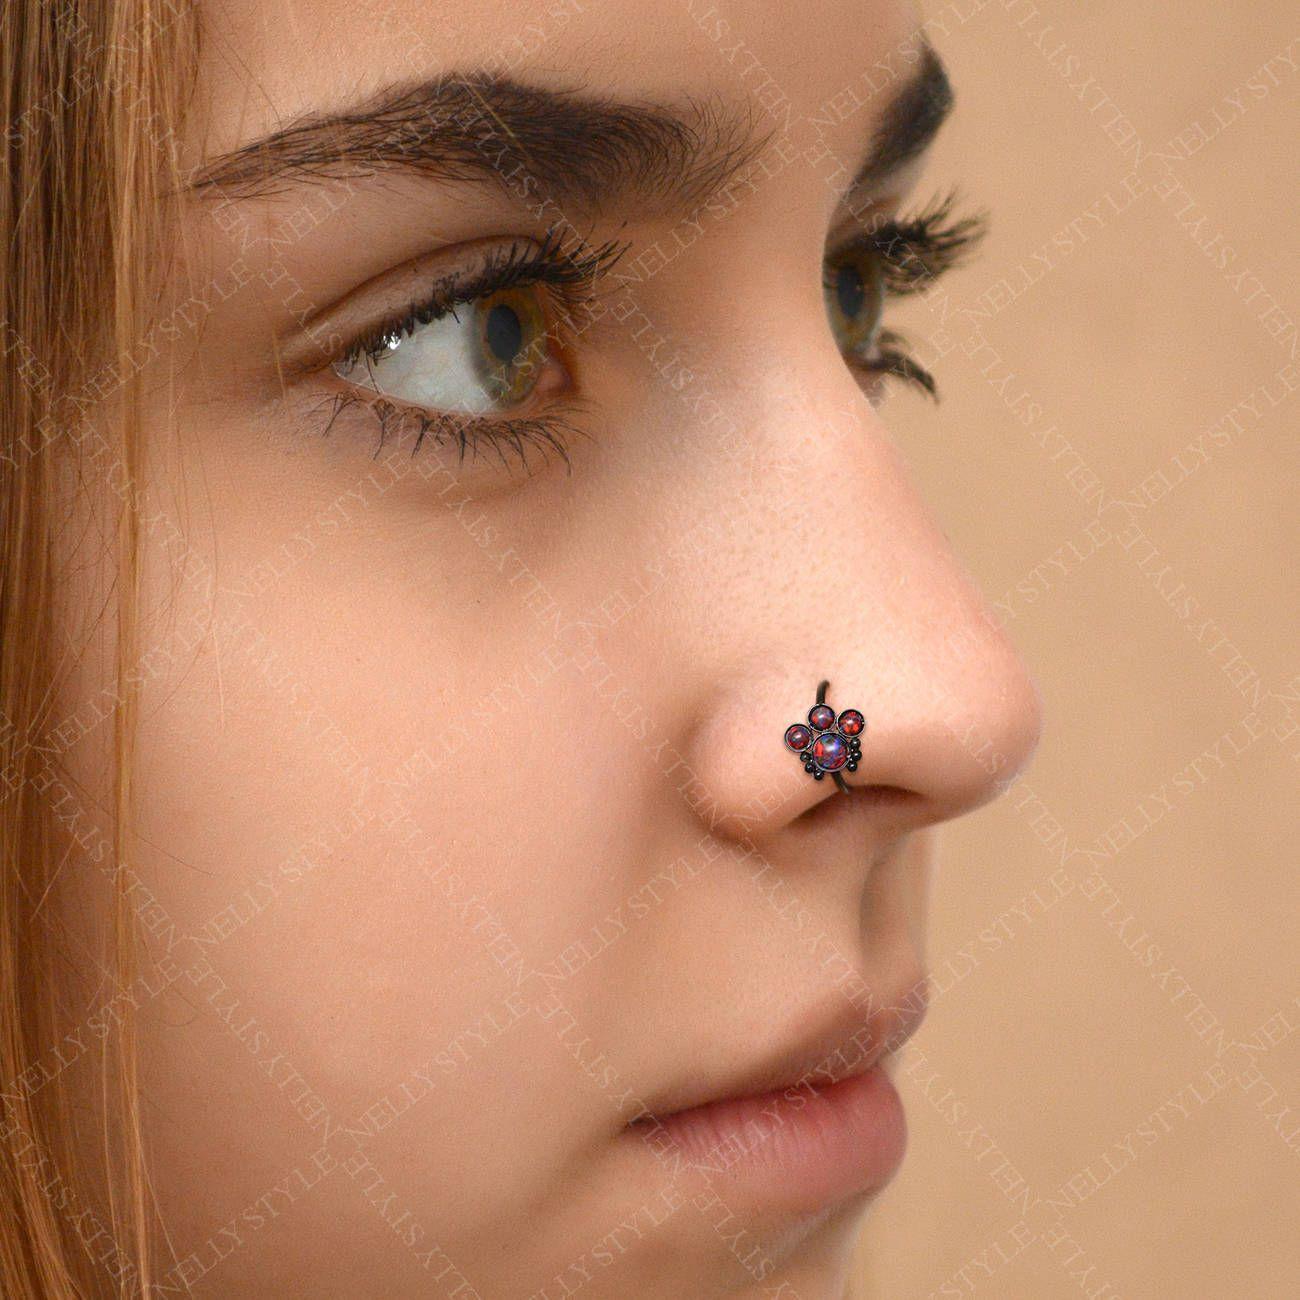 Nose Hoop Ring 20g 316L surgical steel nose piercing